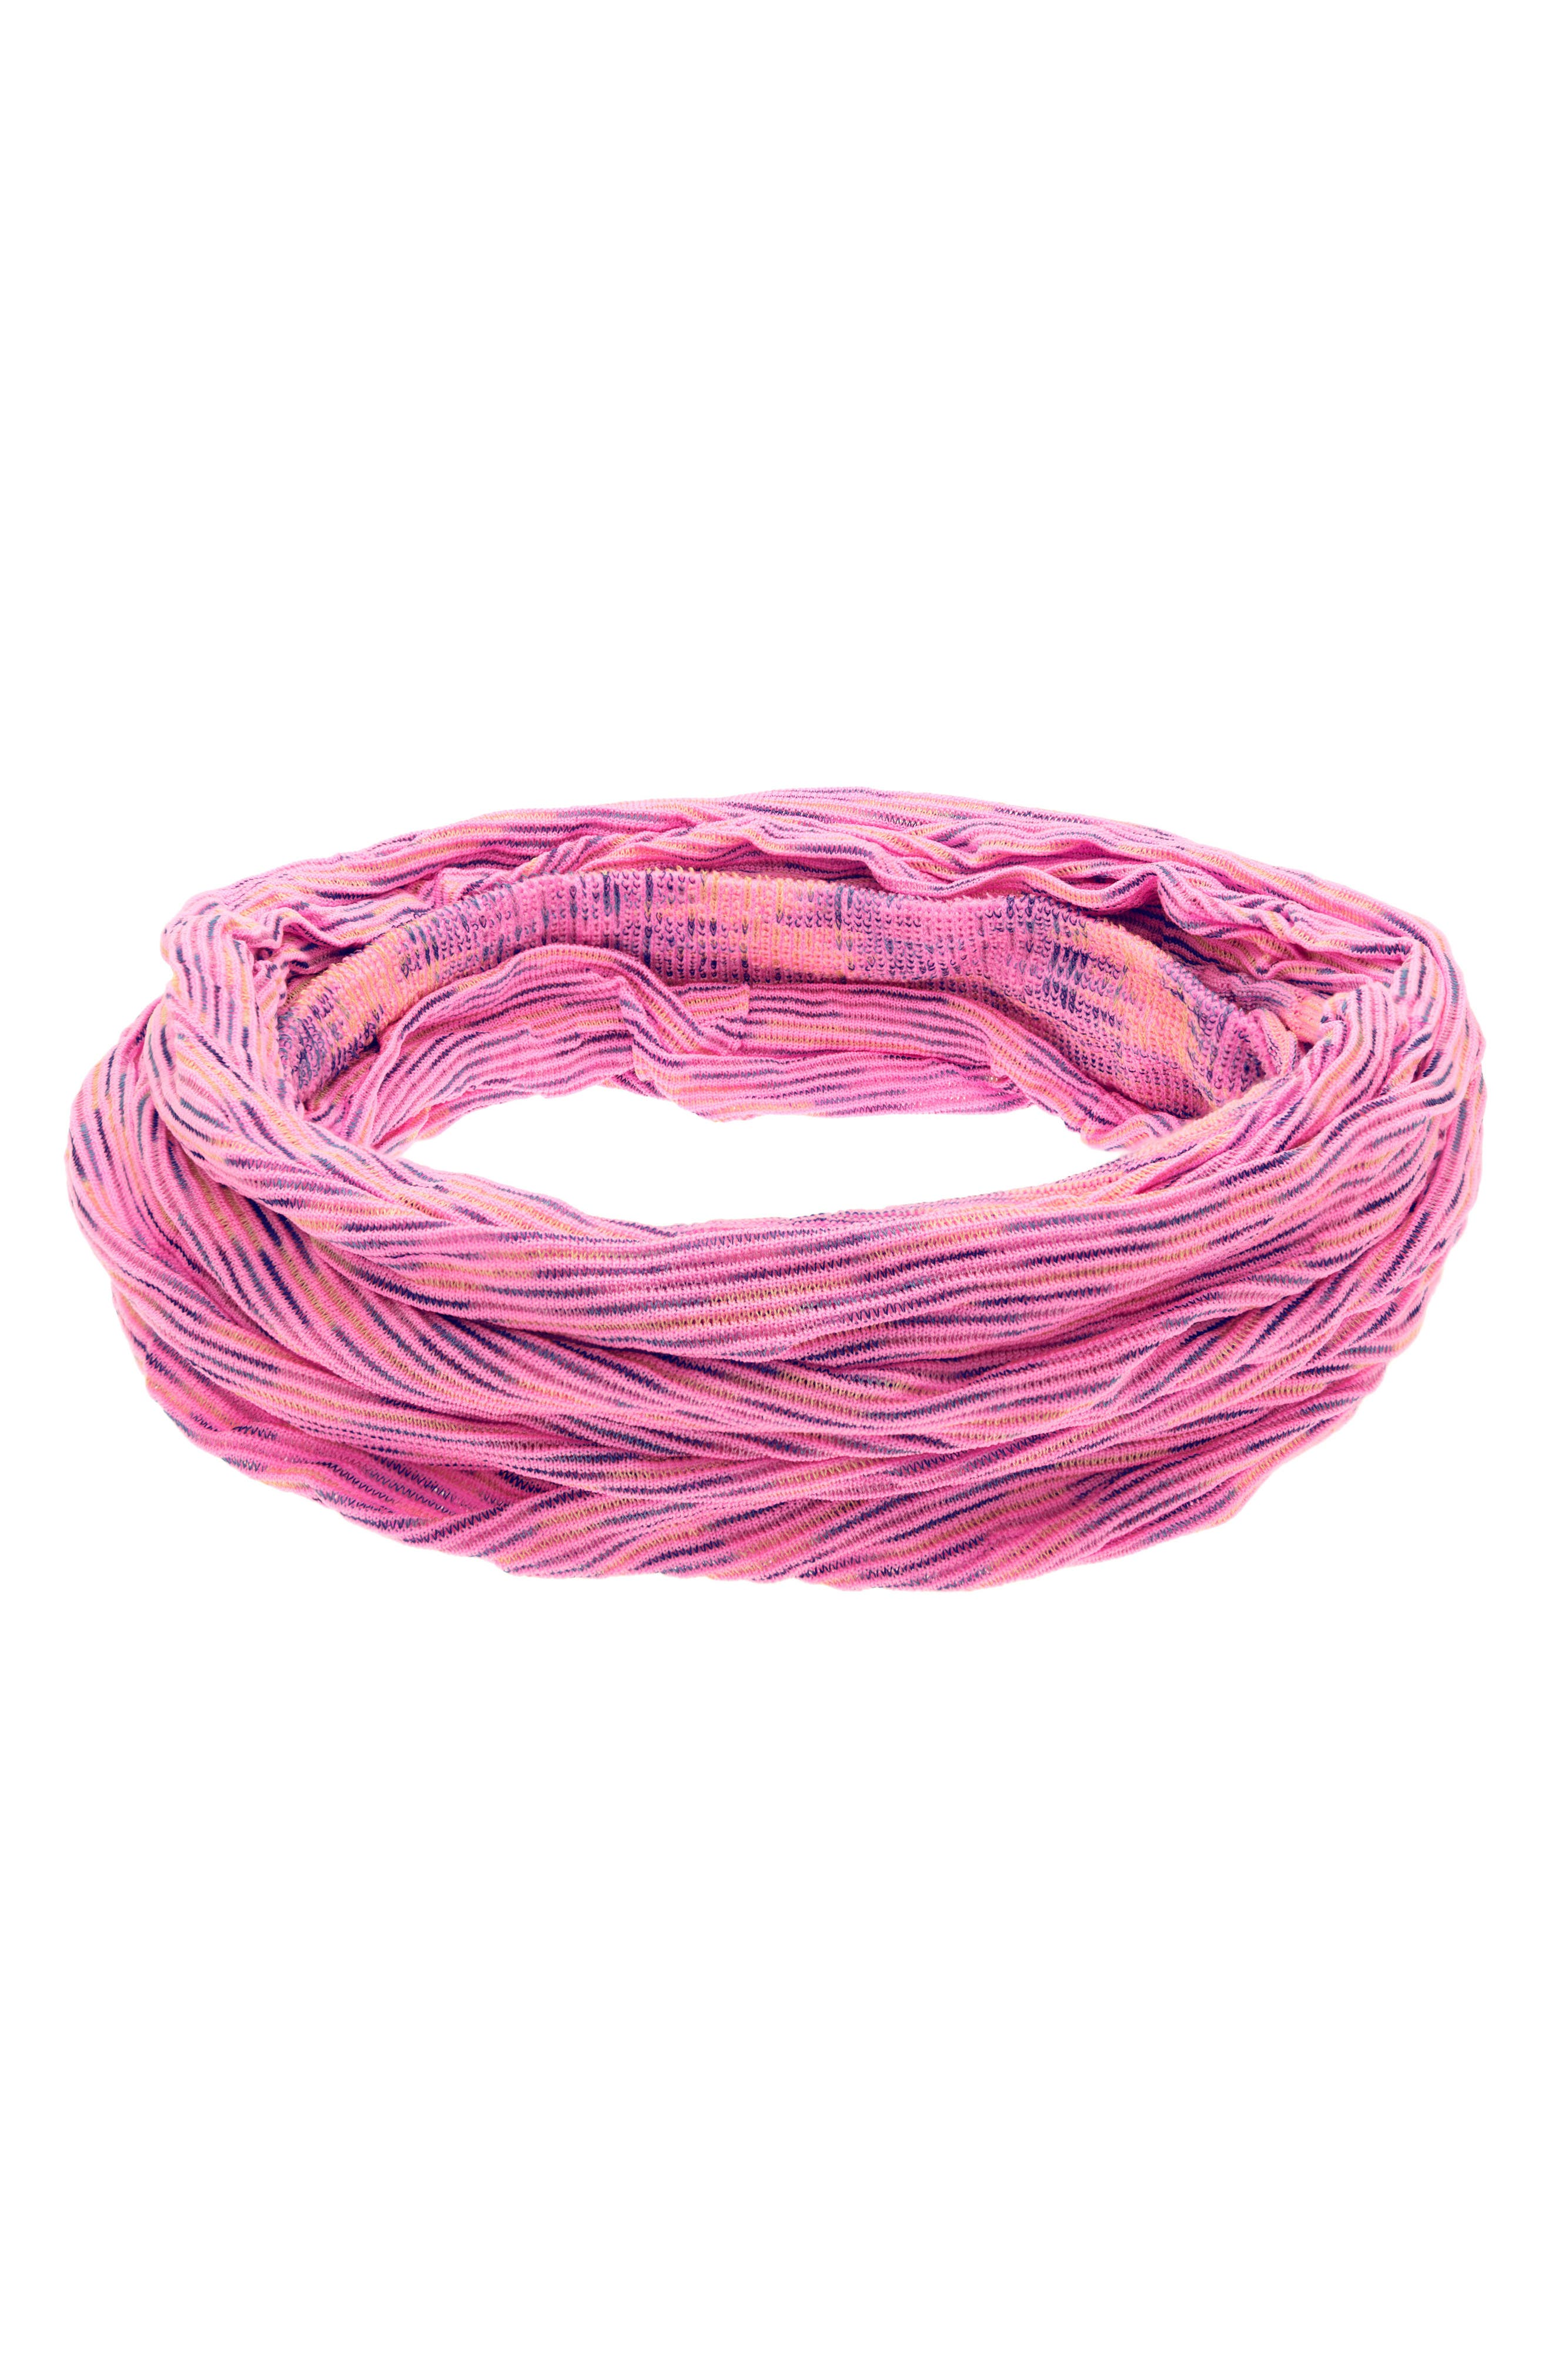 Alternate Image 2  - L. Erickson Space Dye Relaxed Turban Head Wrap